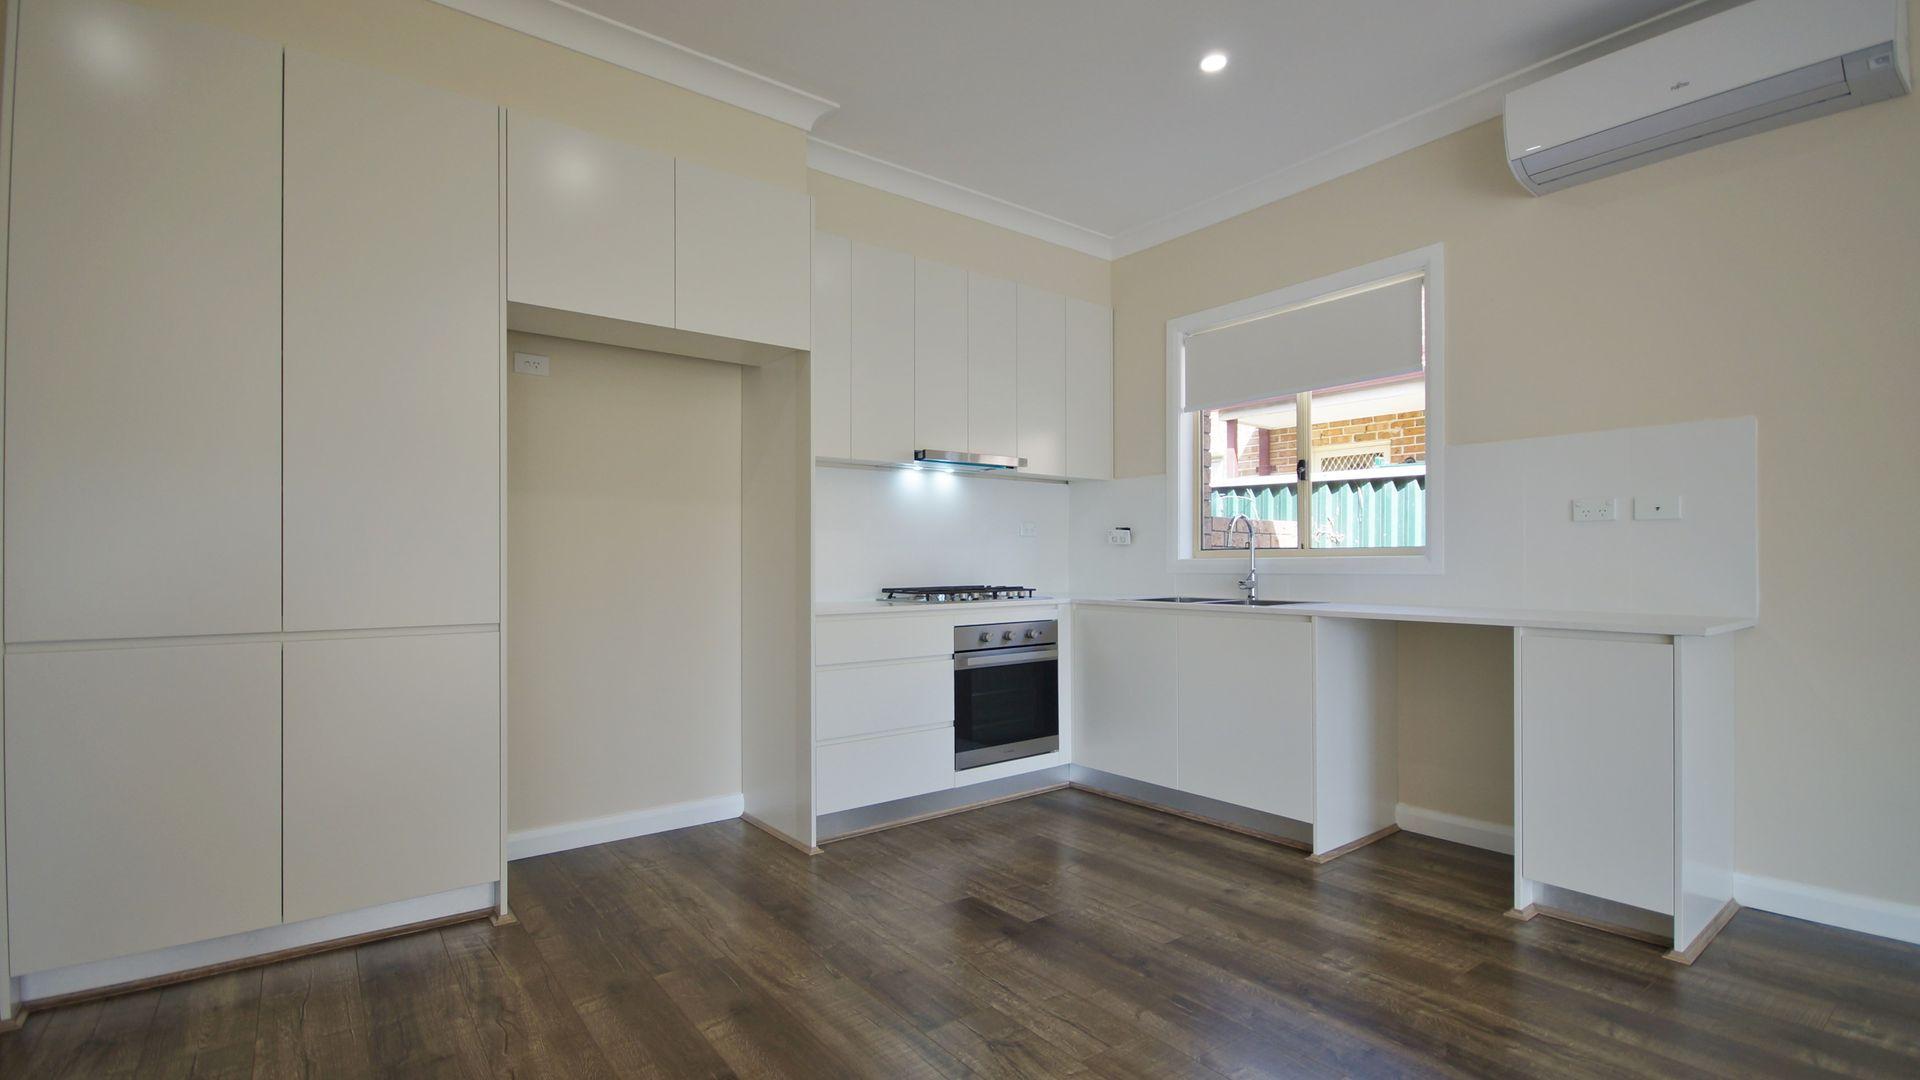 24 Oxford St, Lidcombe NSW 2141, Image 1